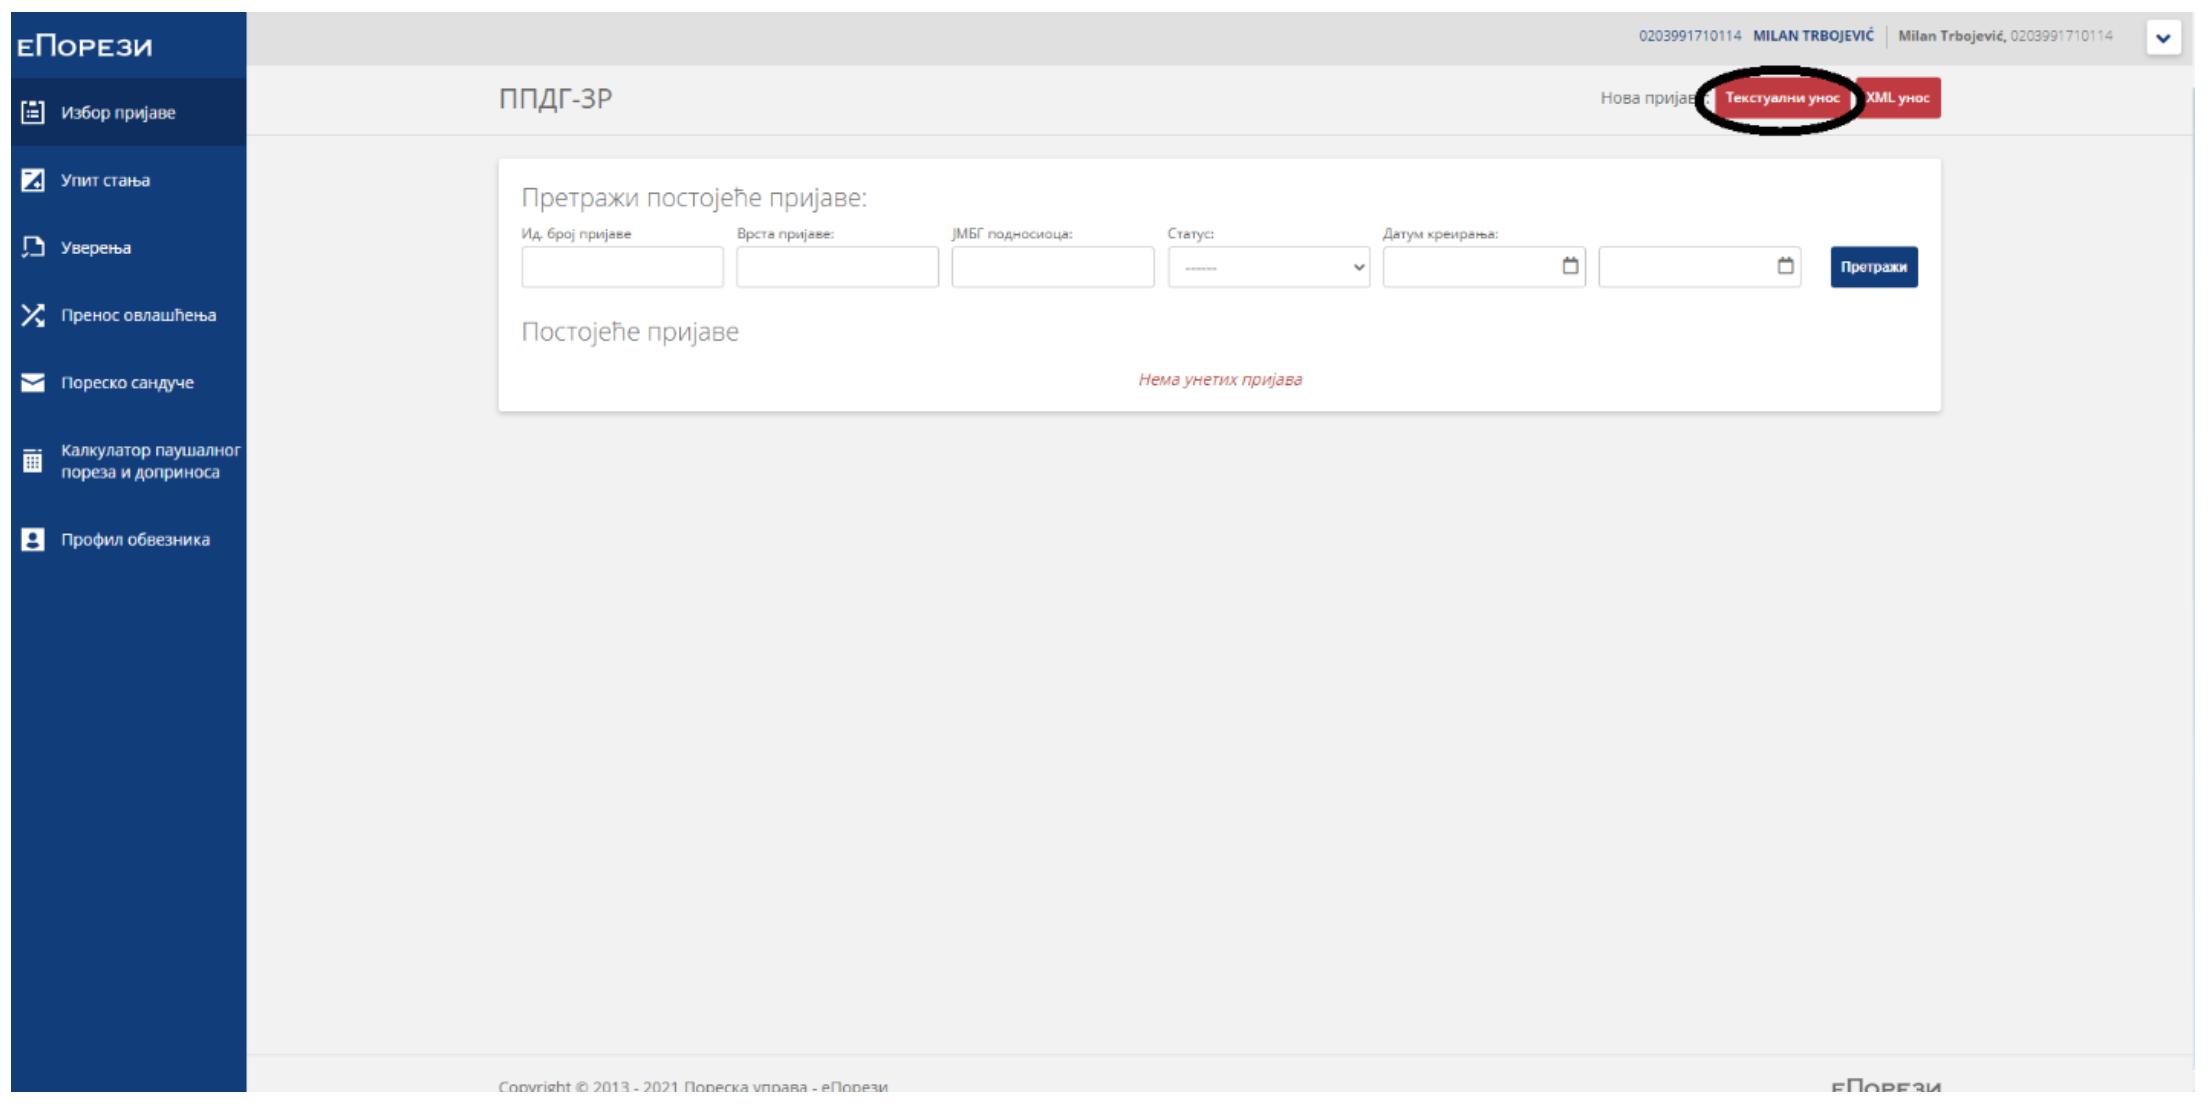 Online prijava poreza, obrazac PPDG-3R, slika 1